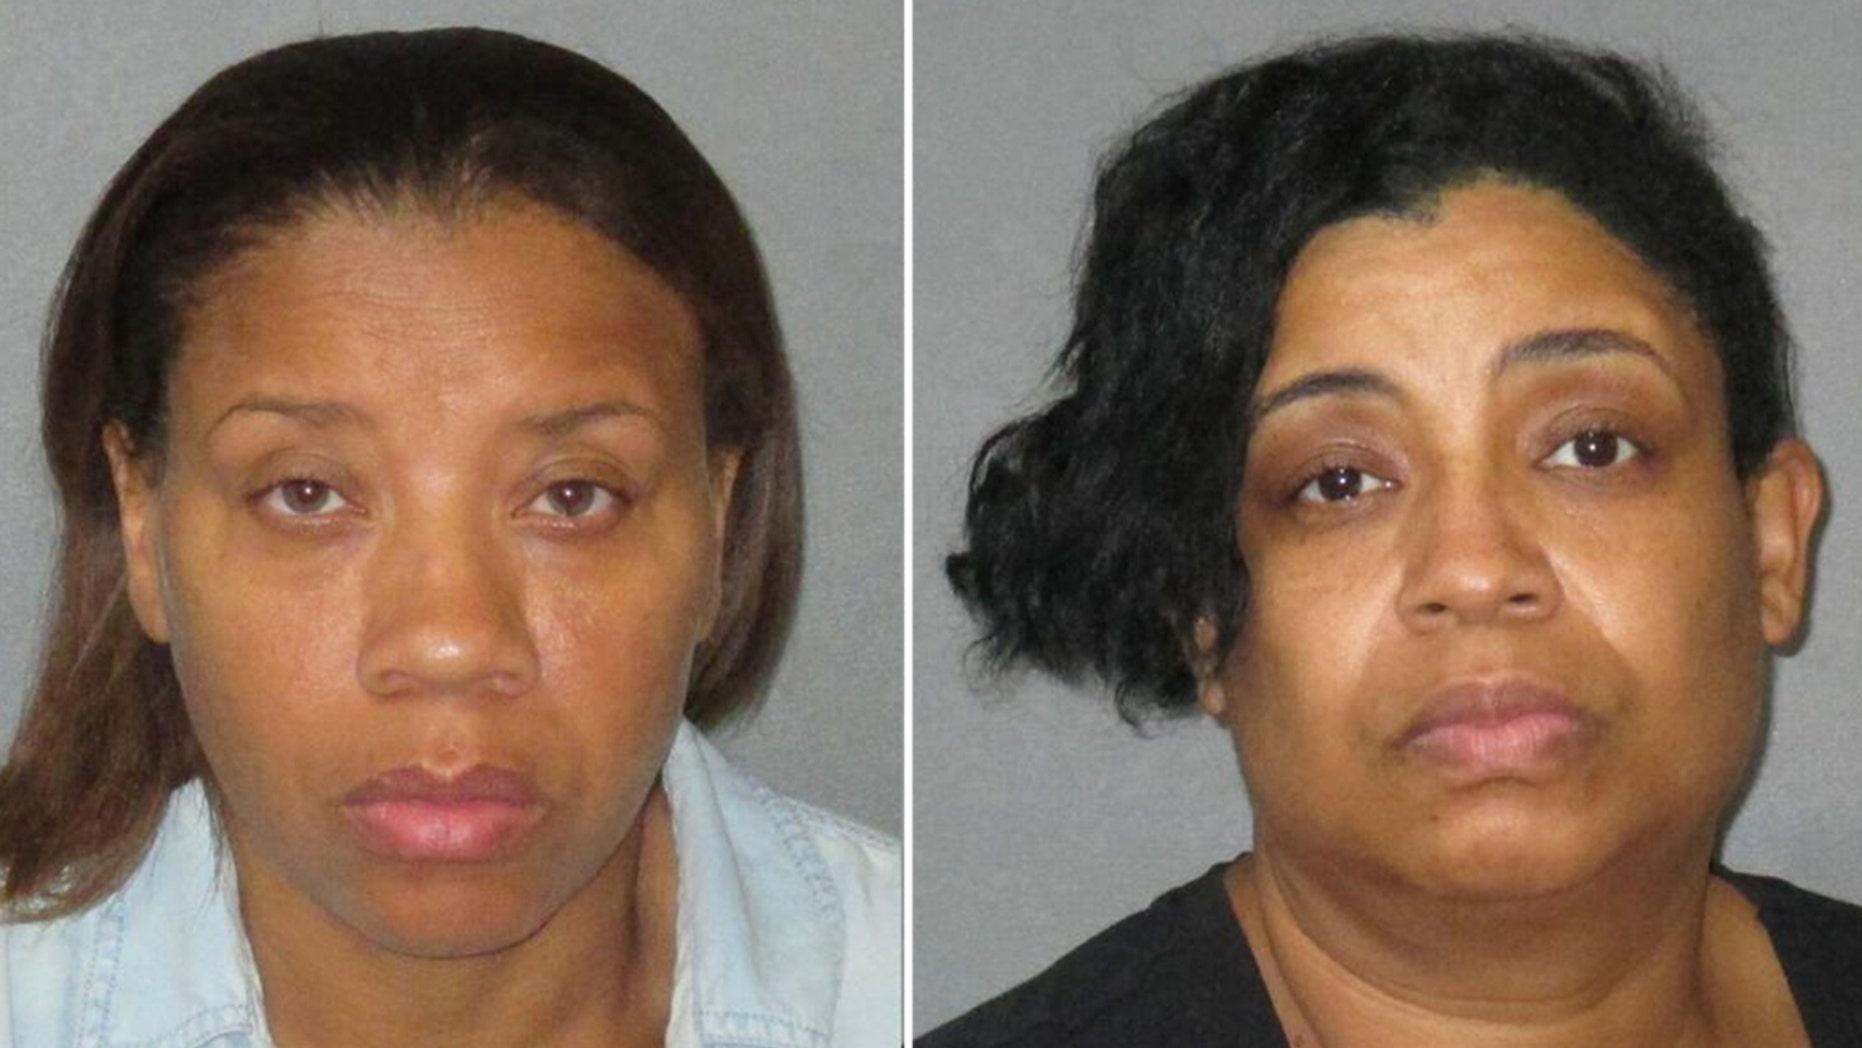 Mugshots for Tammy Dabney, left, 48, and Erica Dabney, 46.